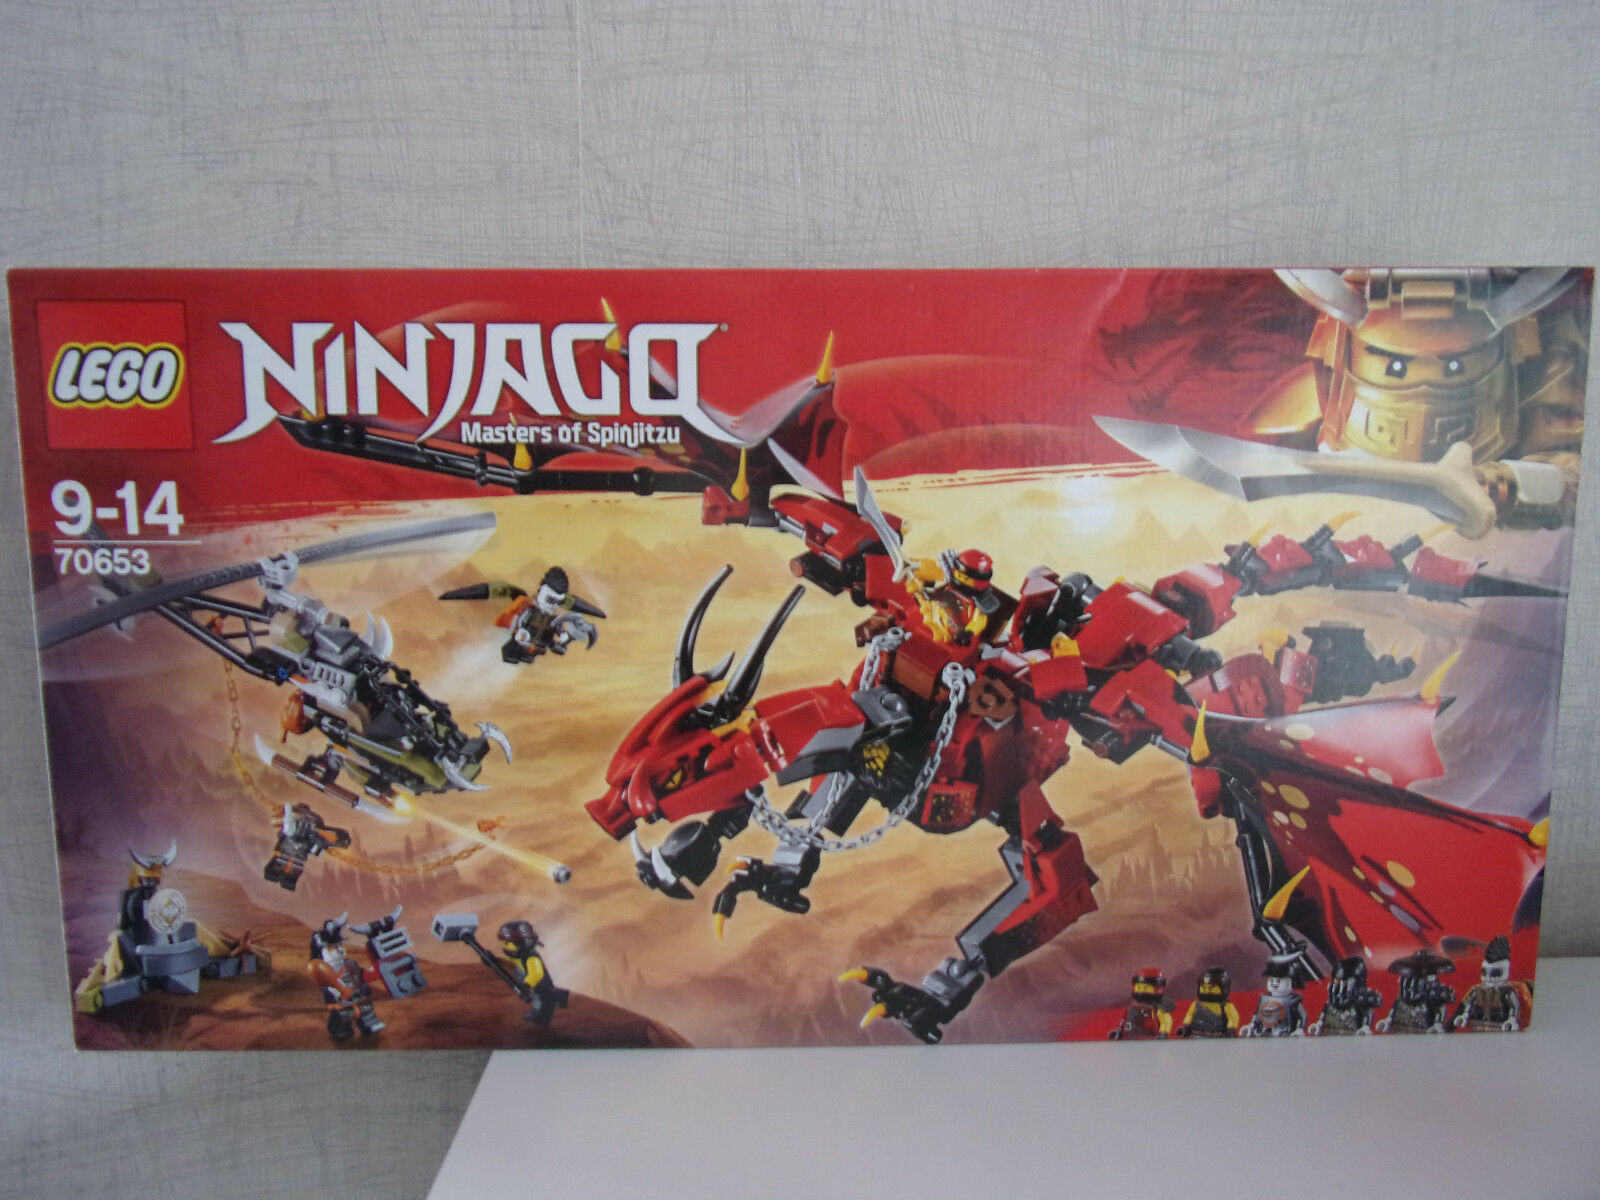 Lego Ninjago (Master of Spinjitzu) 70653 Mutter der Drachen - NEU & OVP